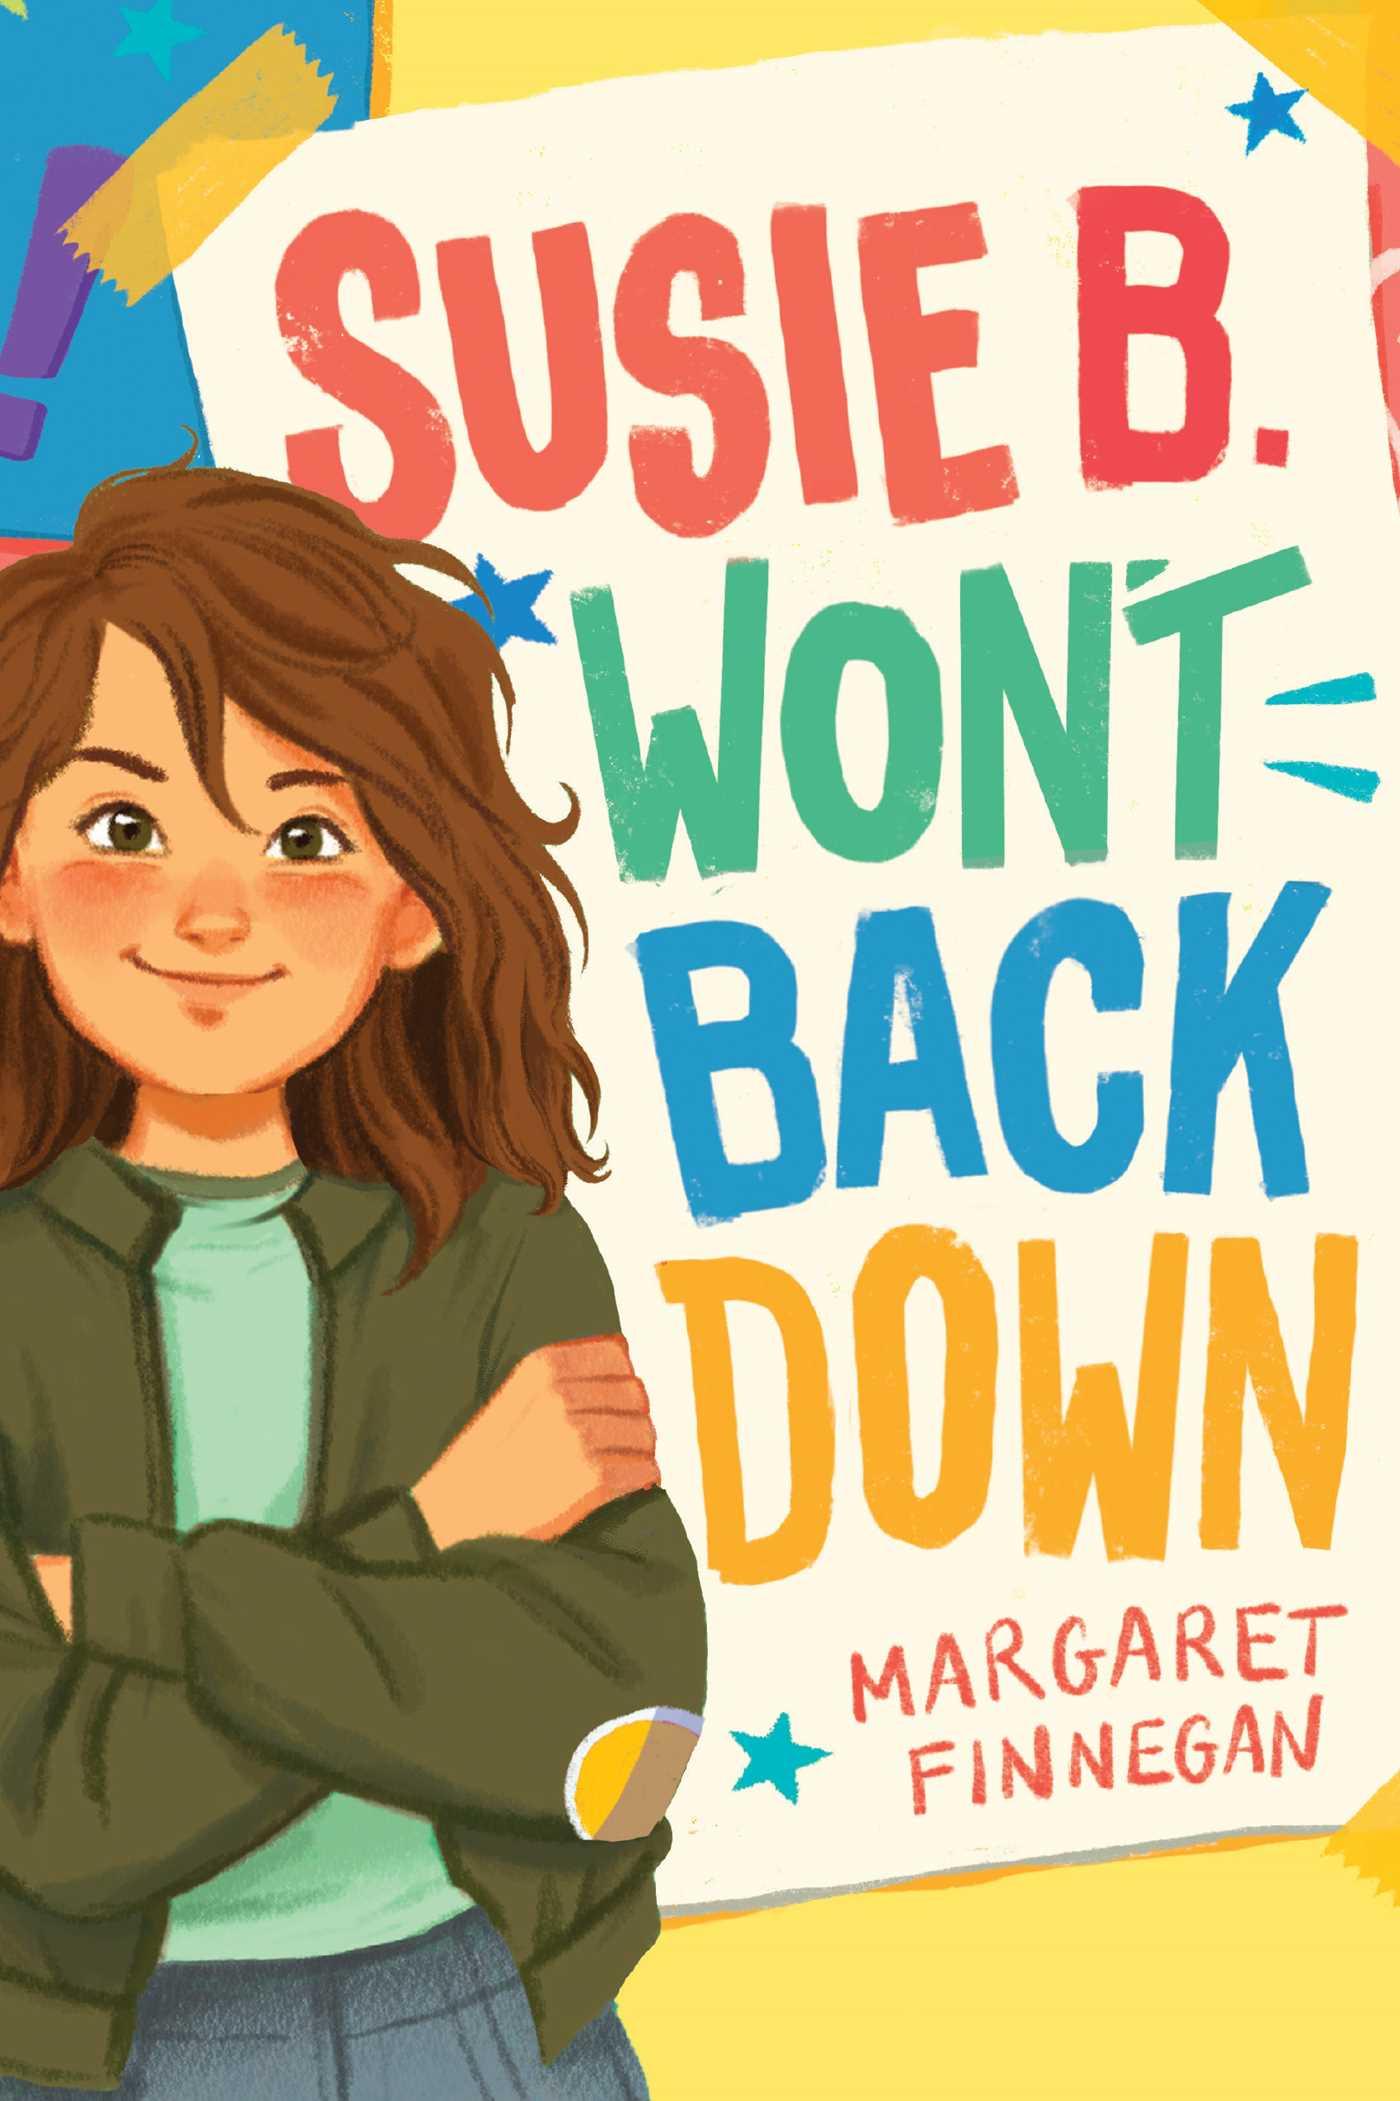 Susie B. Won't Back Down